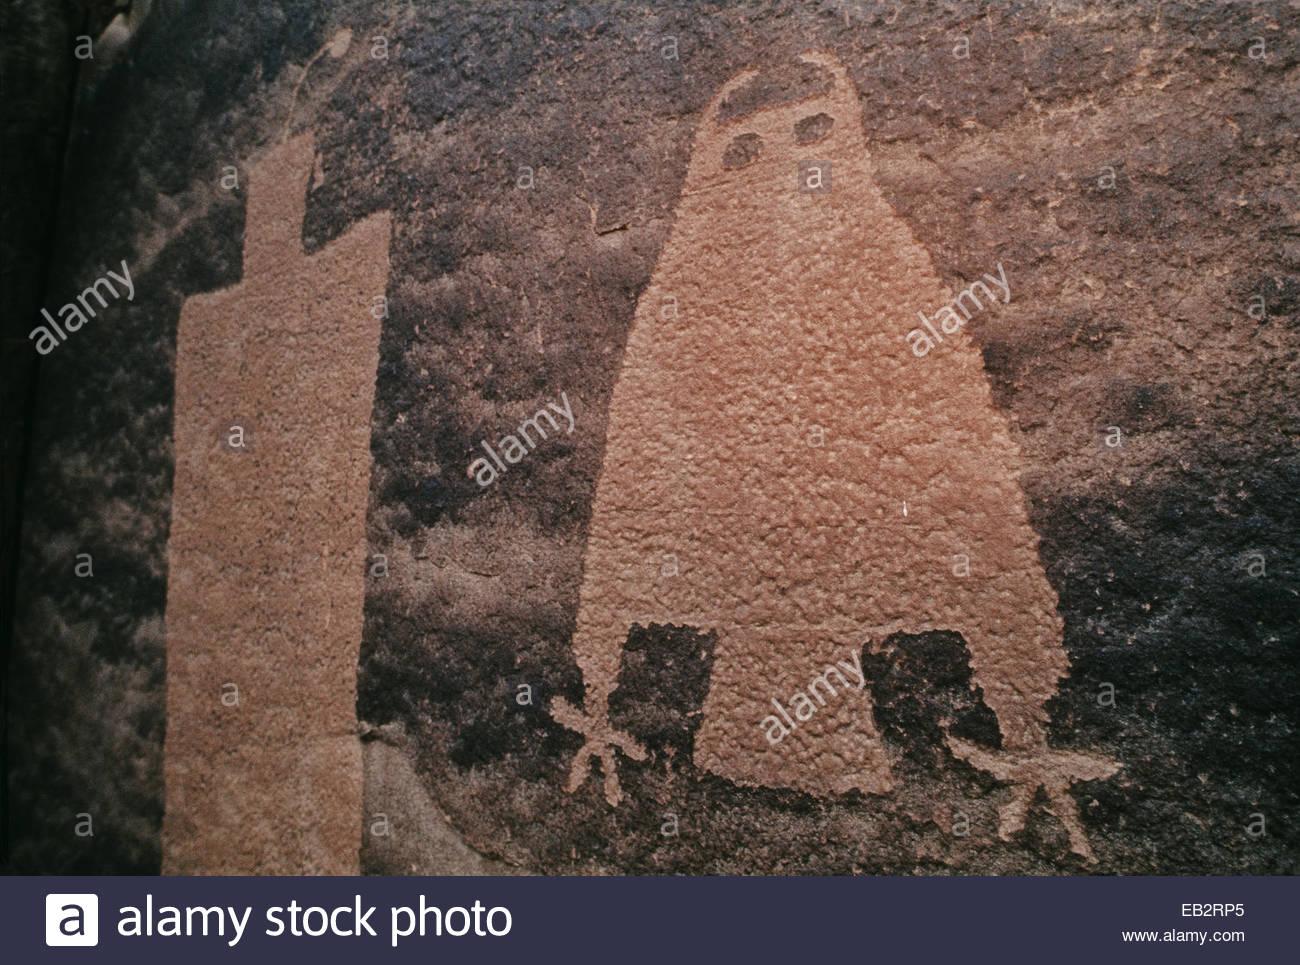 Owl petroglyph in sandstone on Kane Creek just outside Moab, Utah. - Stock Image